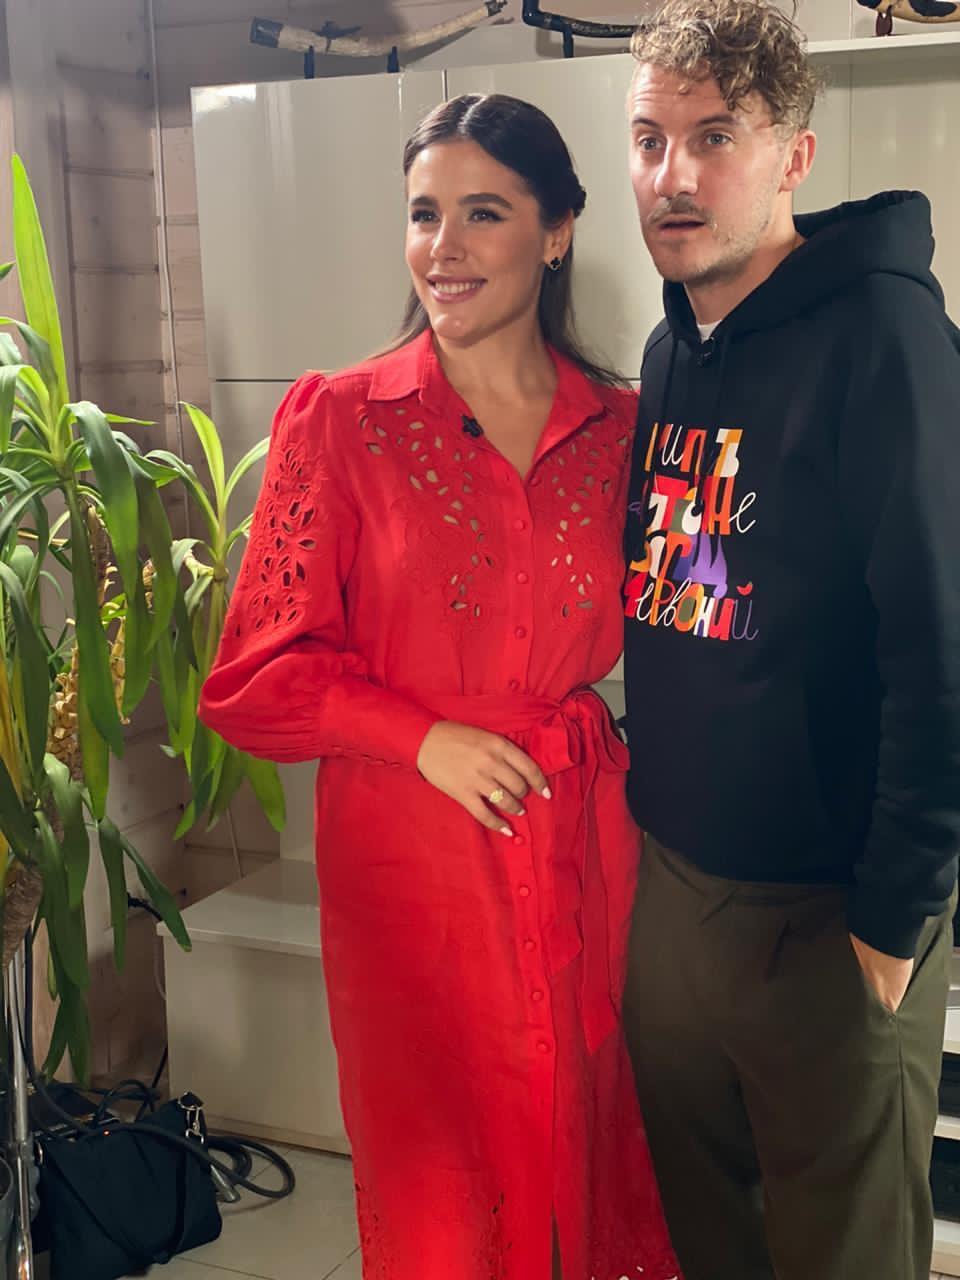 Евгений Клопотенко и Иванна Онуфрийчук